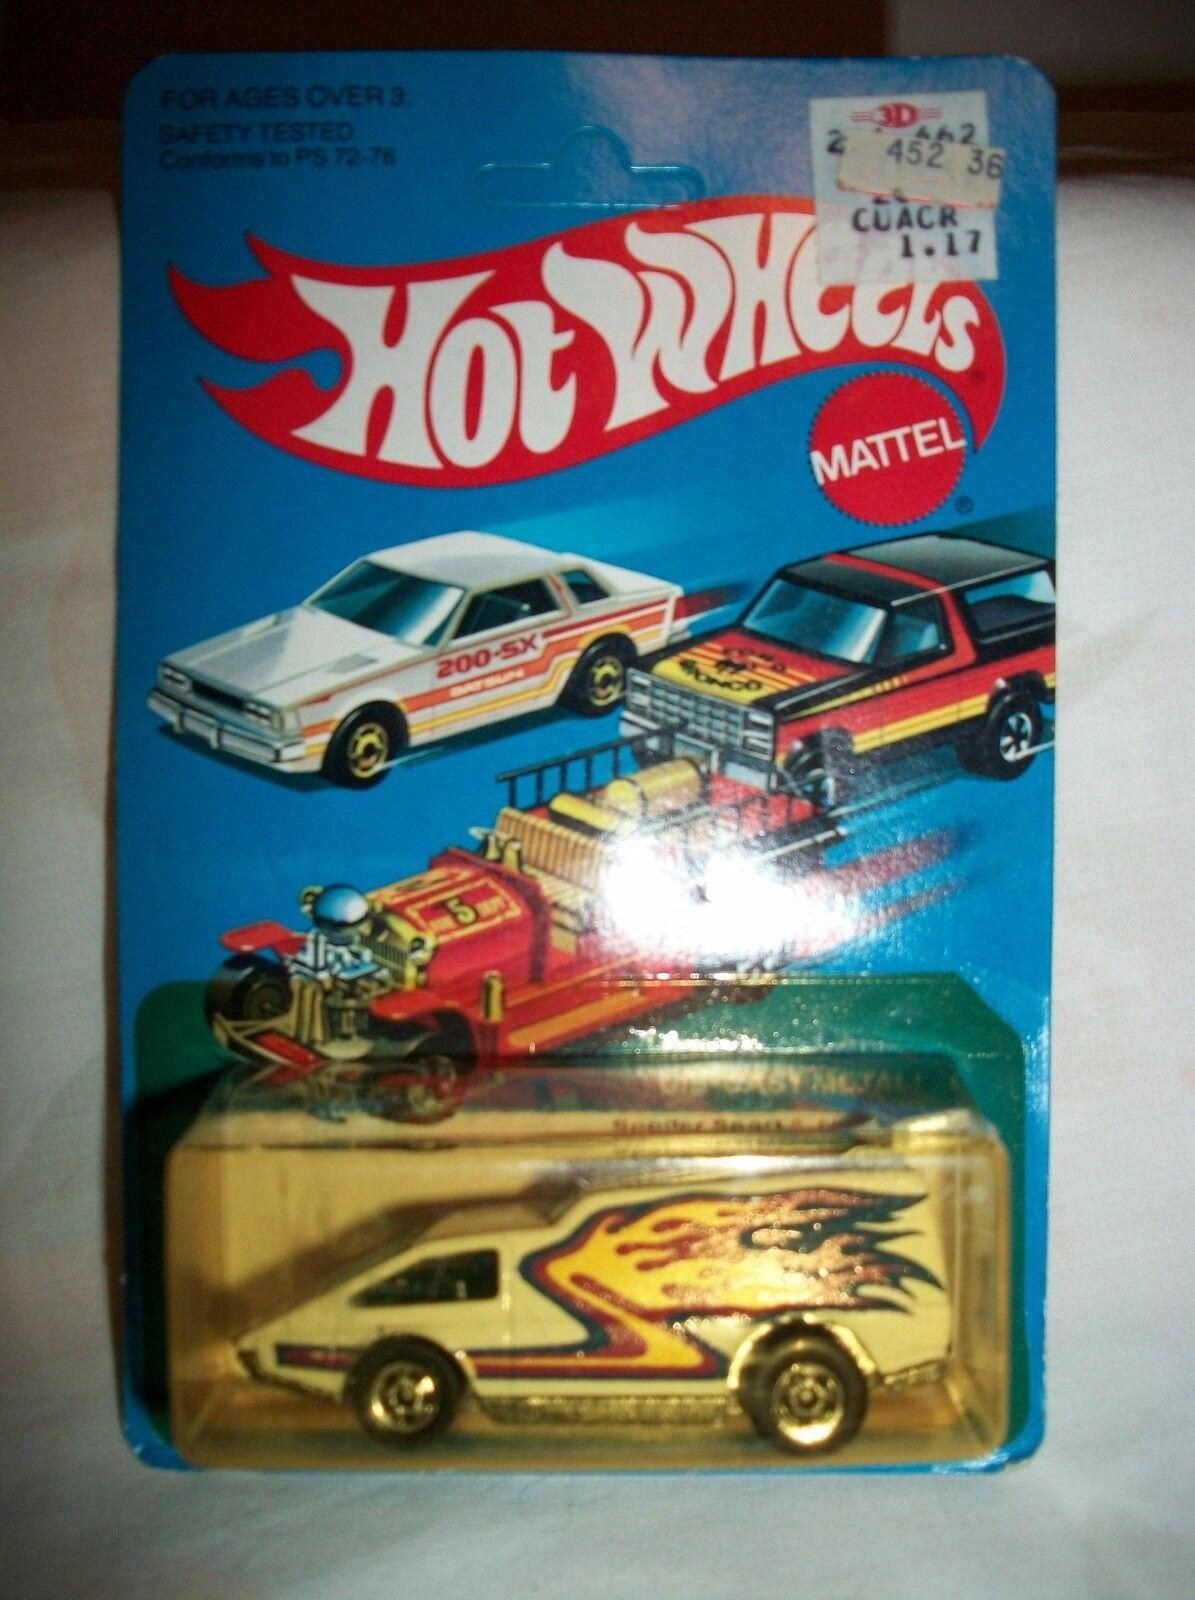 HOT WHEELS 1981 SPOILER SPORT NO. 9641 bianca RARE  DIE CAST METAL UNPUNCHED